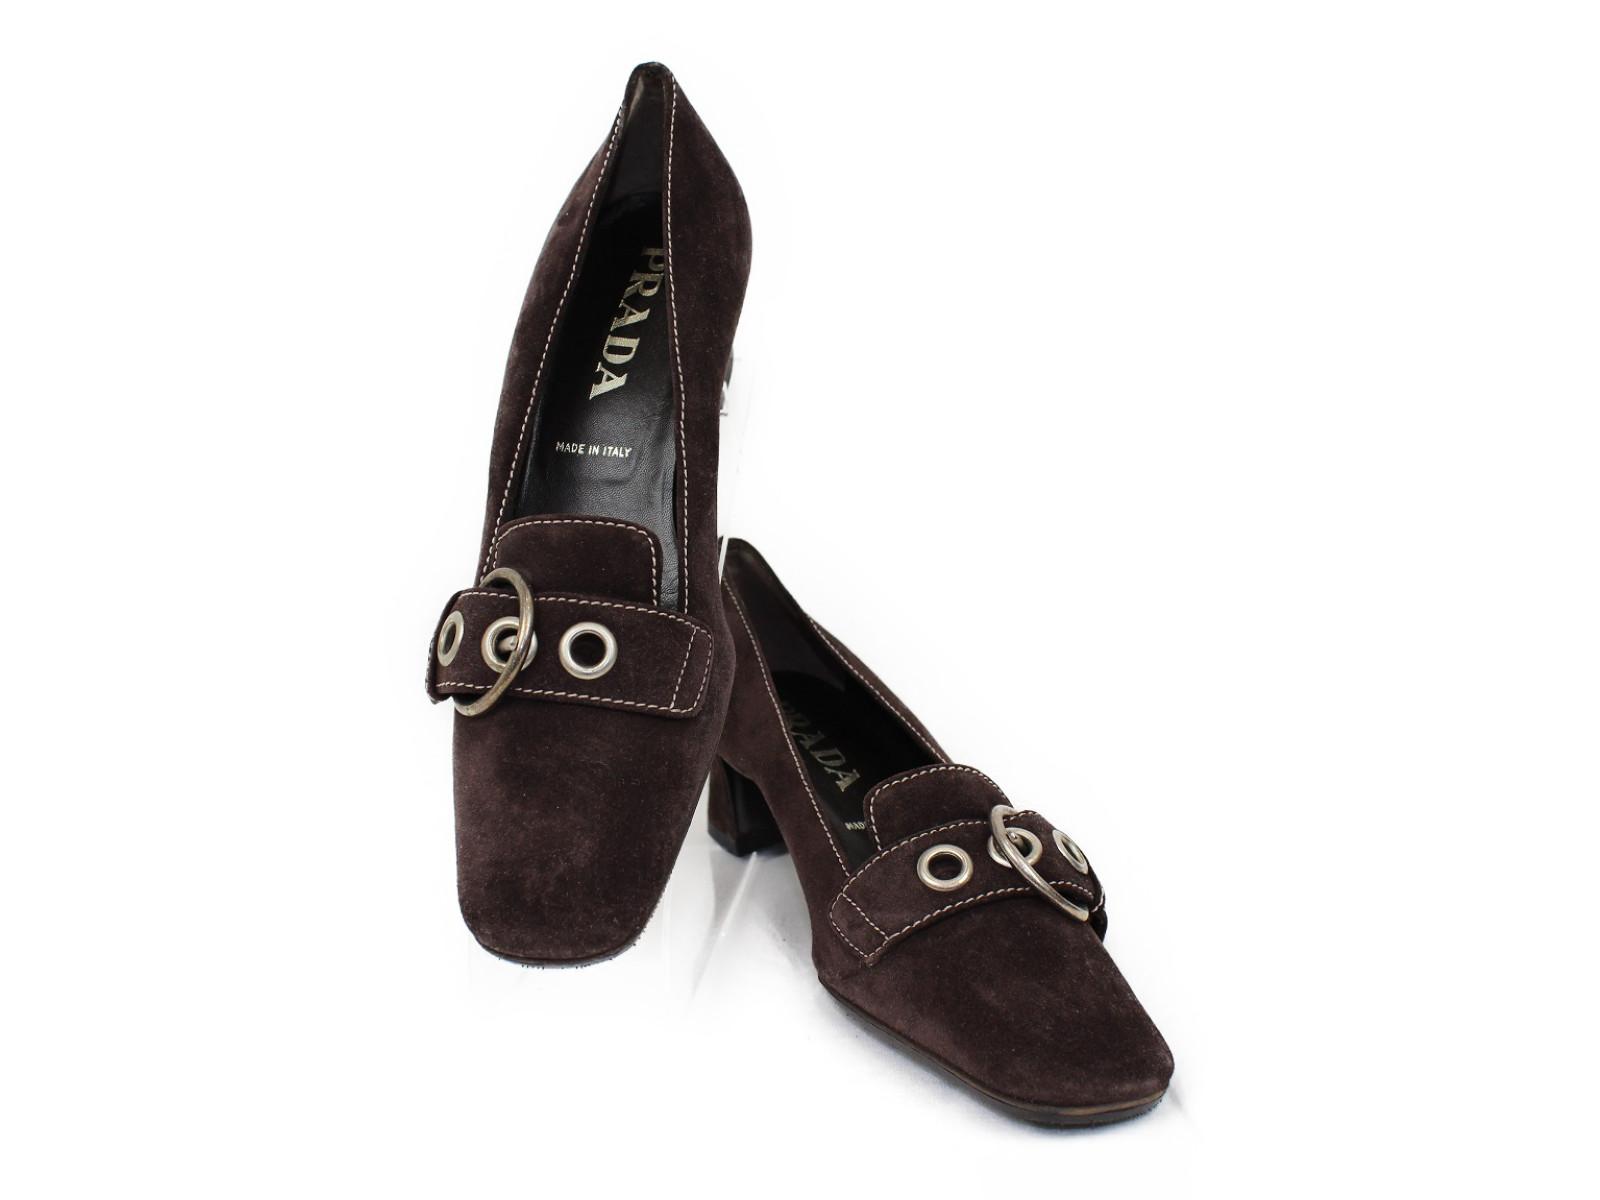 PRADA(プラダ)ヒールローファー DNC544ブラウン シルバー金具 スウェード靴 サイズ36 1/2 未使用品【中古】